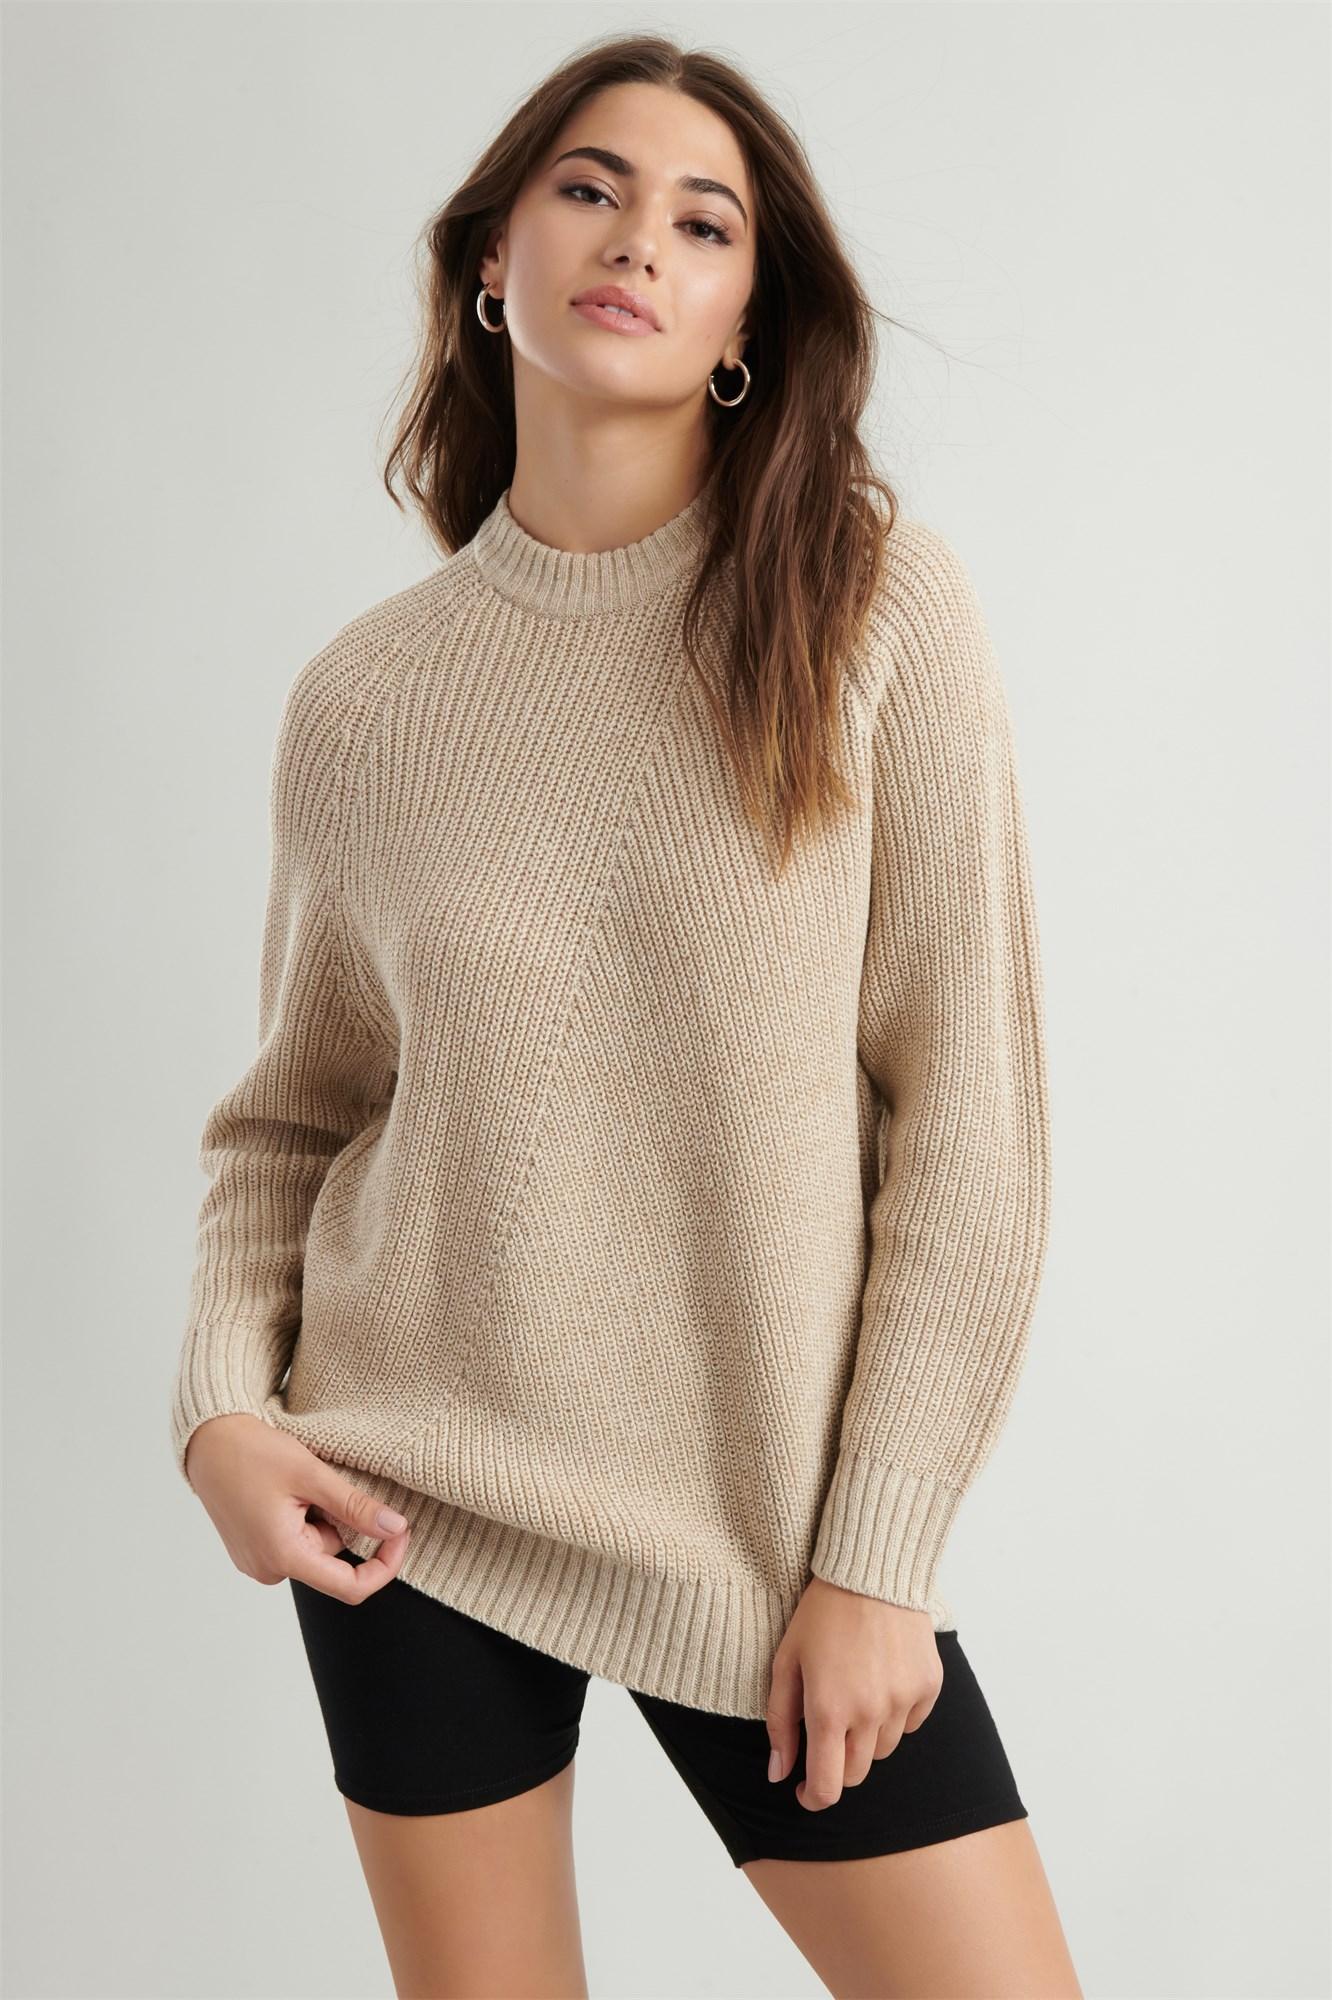 Image 3 of Crew Neck Tunic Sweater